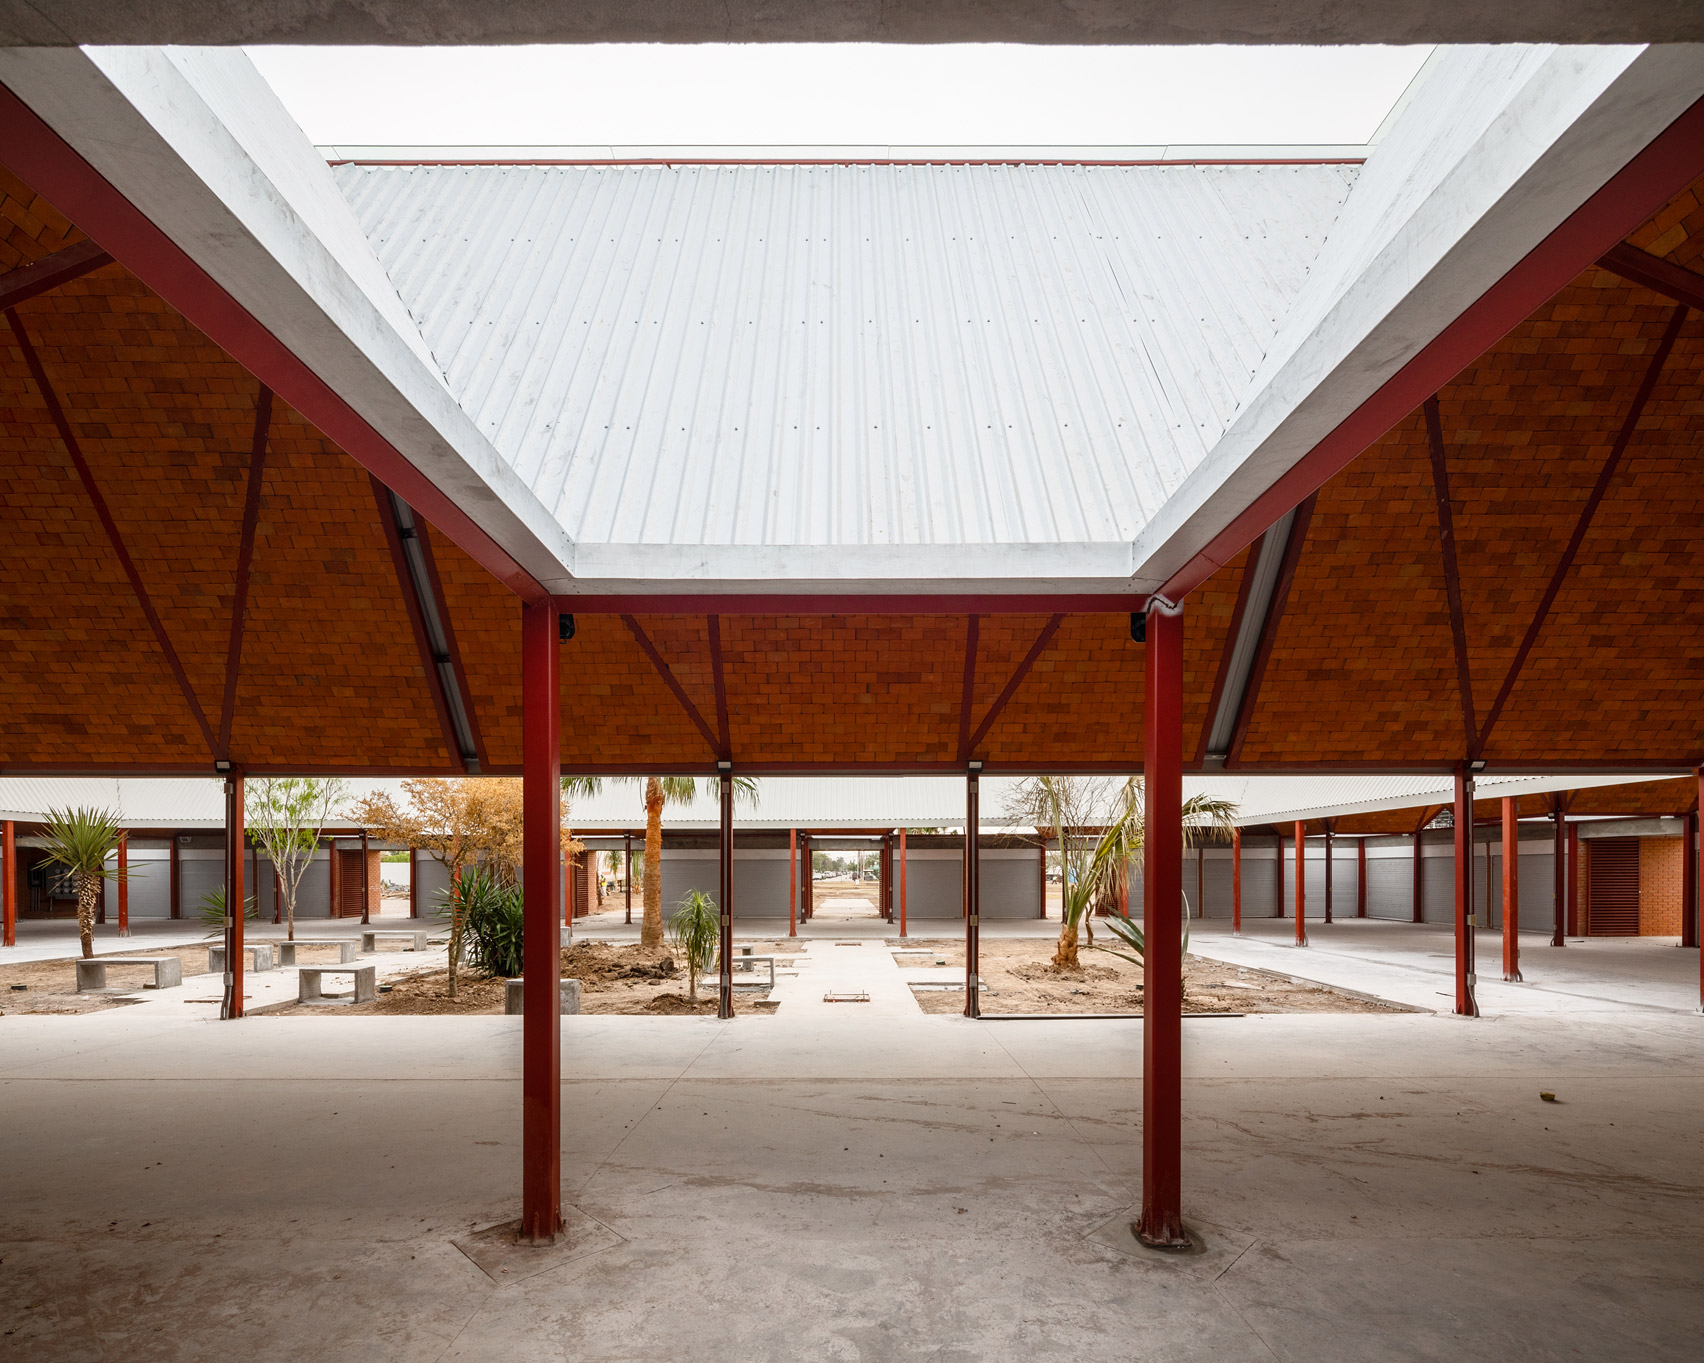 Courtyard garden in Matamoros Market by Colectivo C733